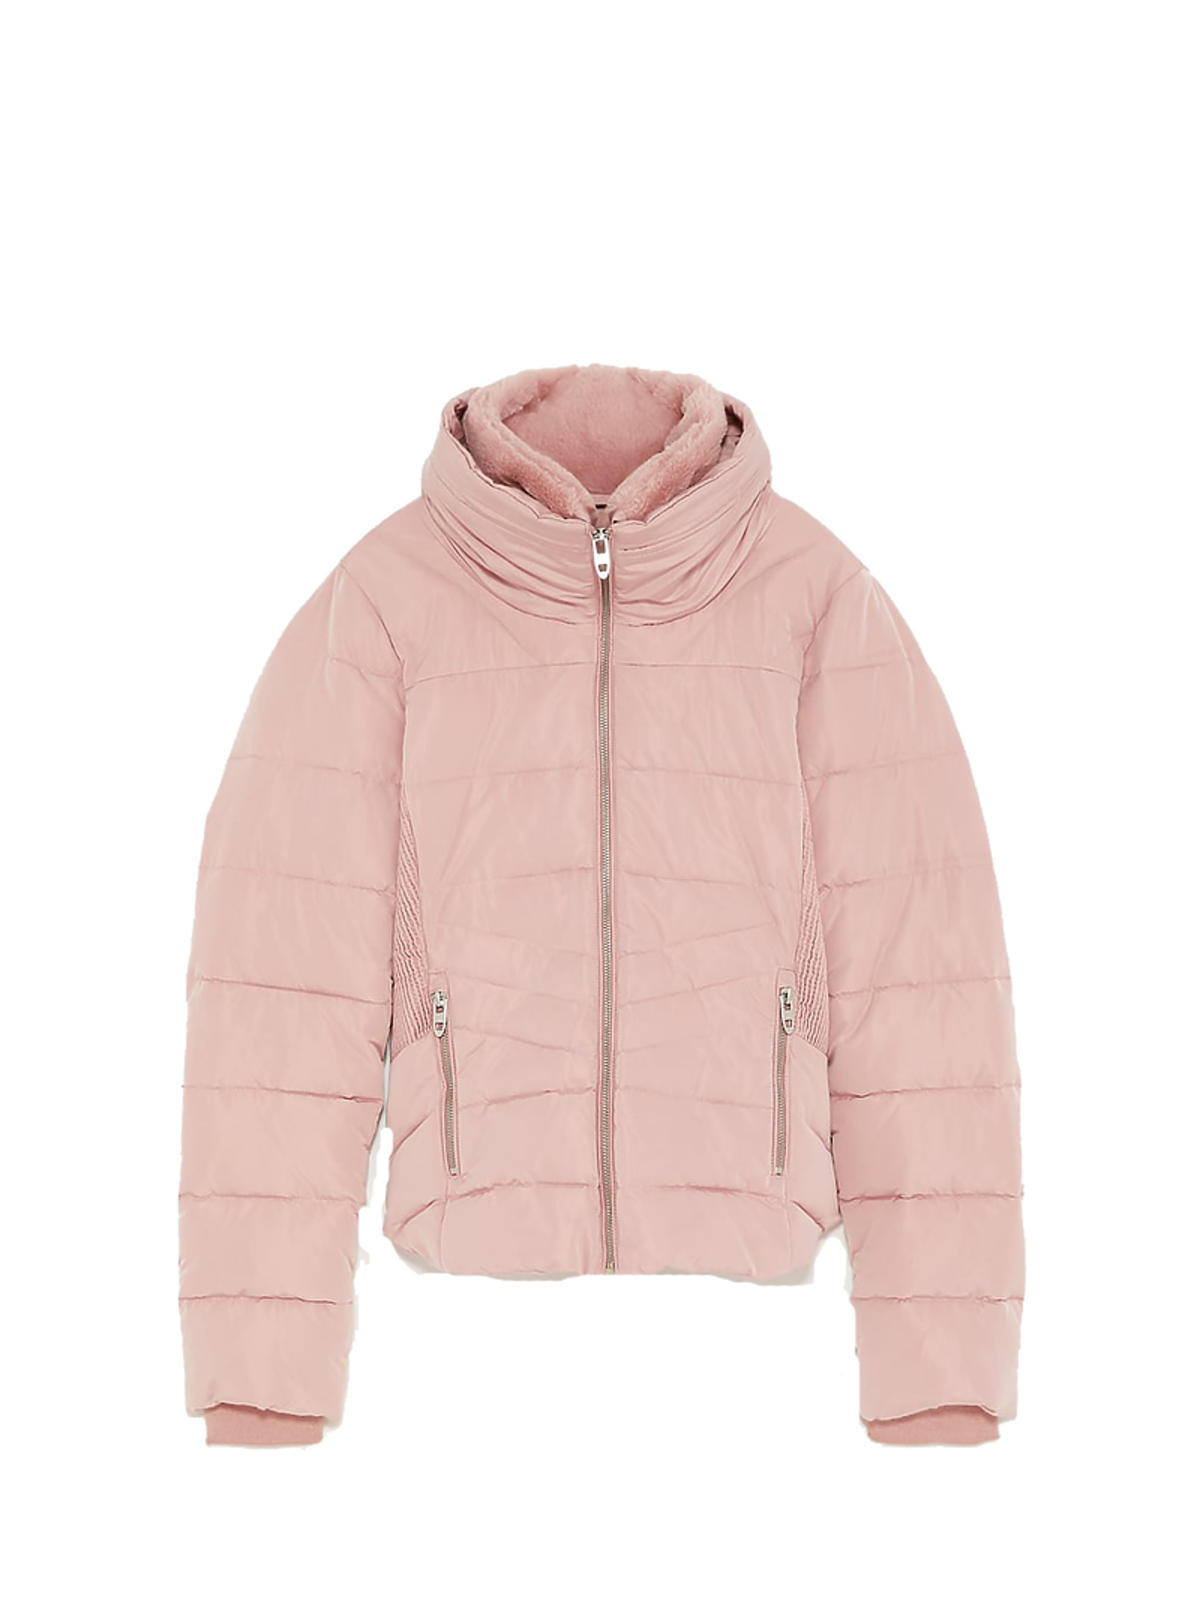 Zara, aktualna cena 299 zł